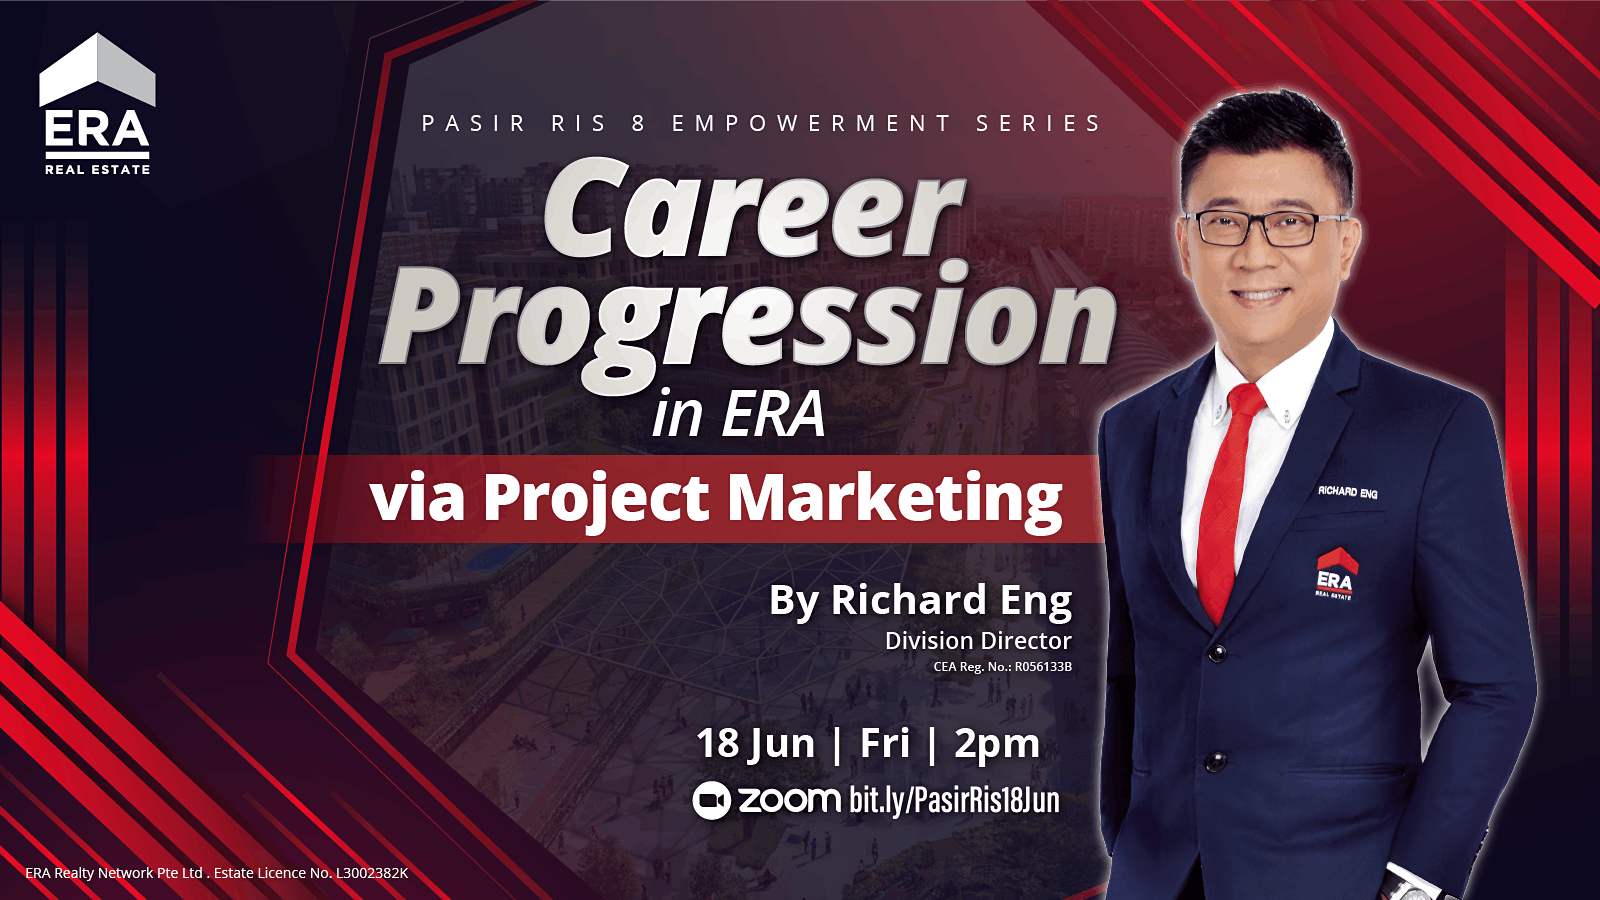 Career Progression in ERA via Project Marketing (Pasir Ris 8 Empowerment)